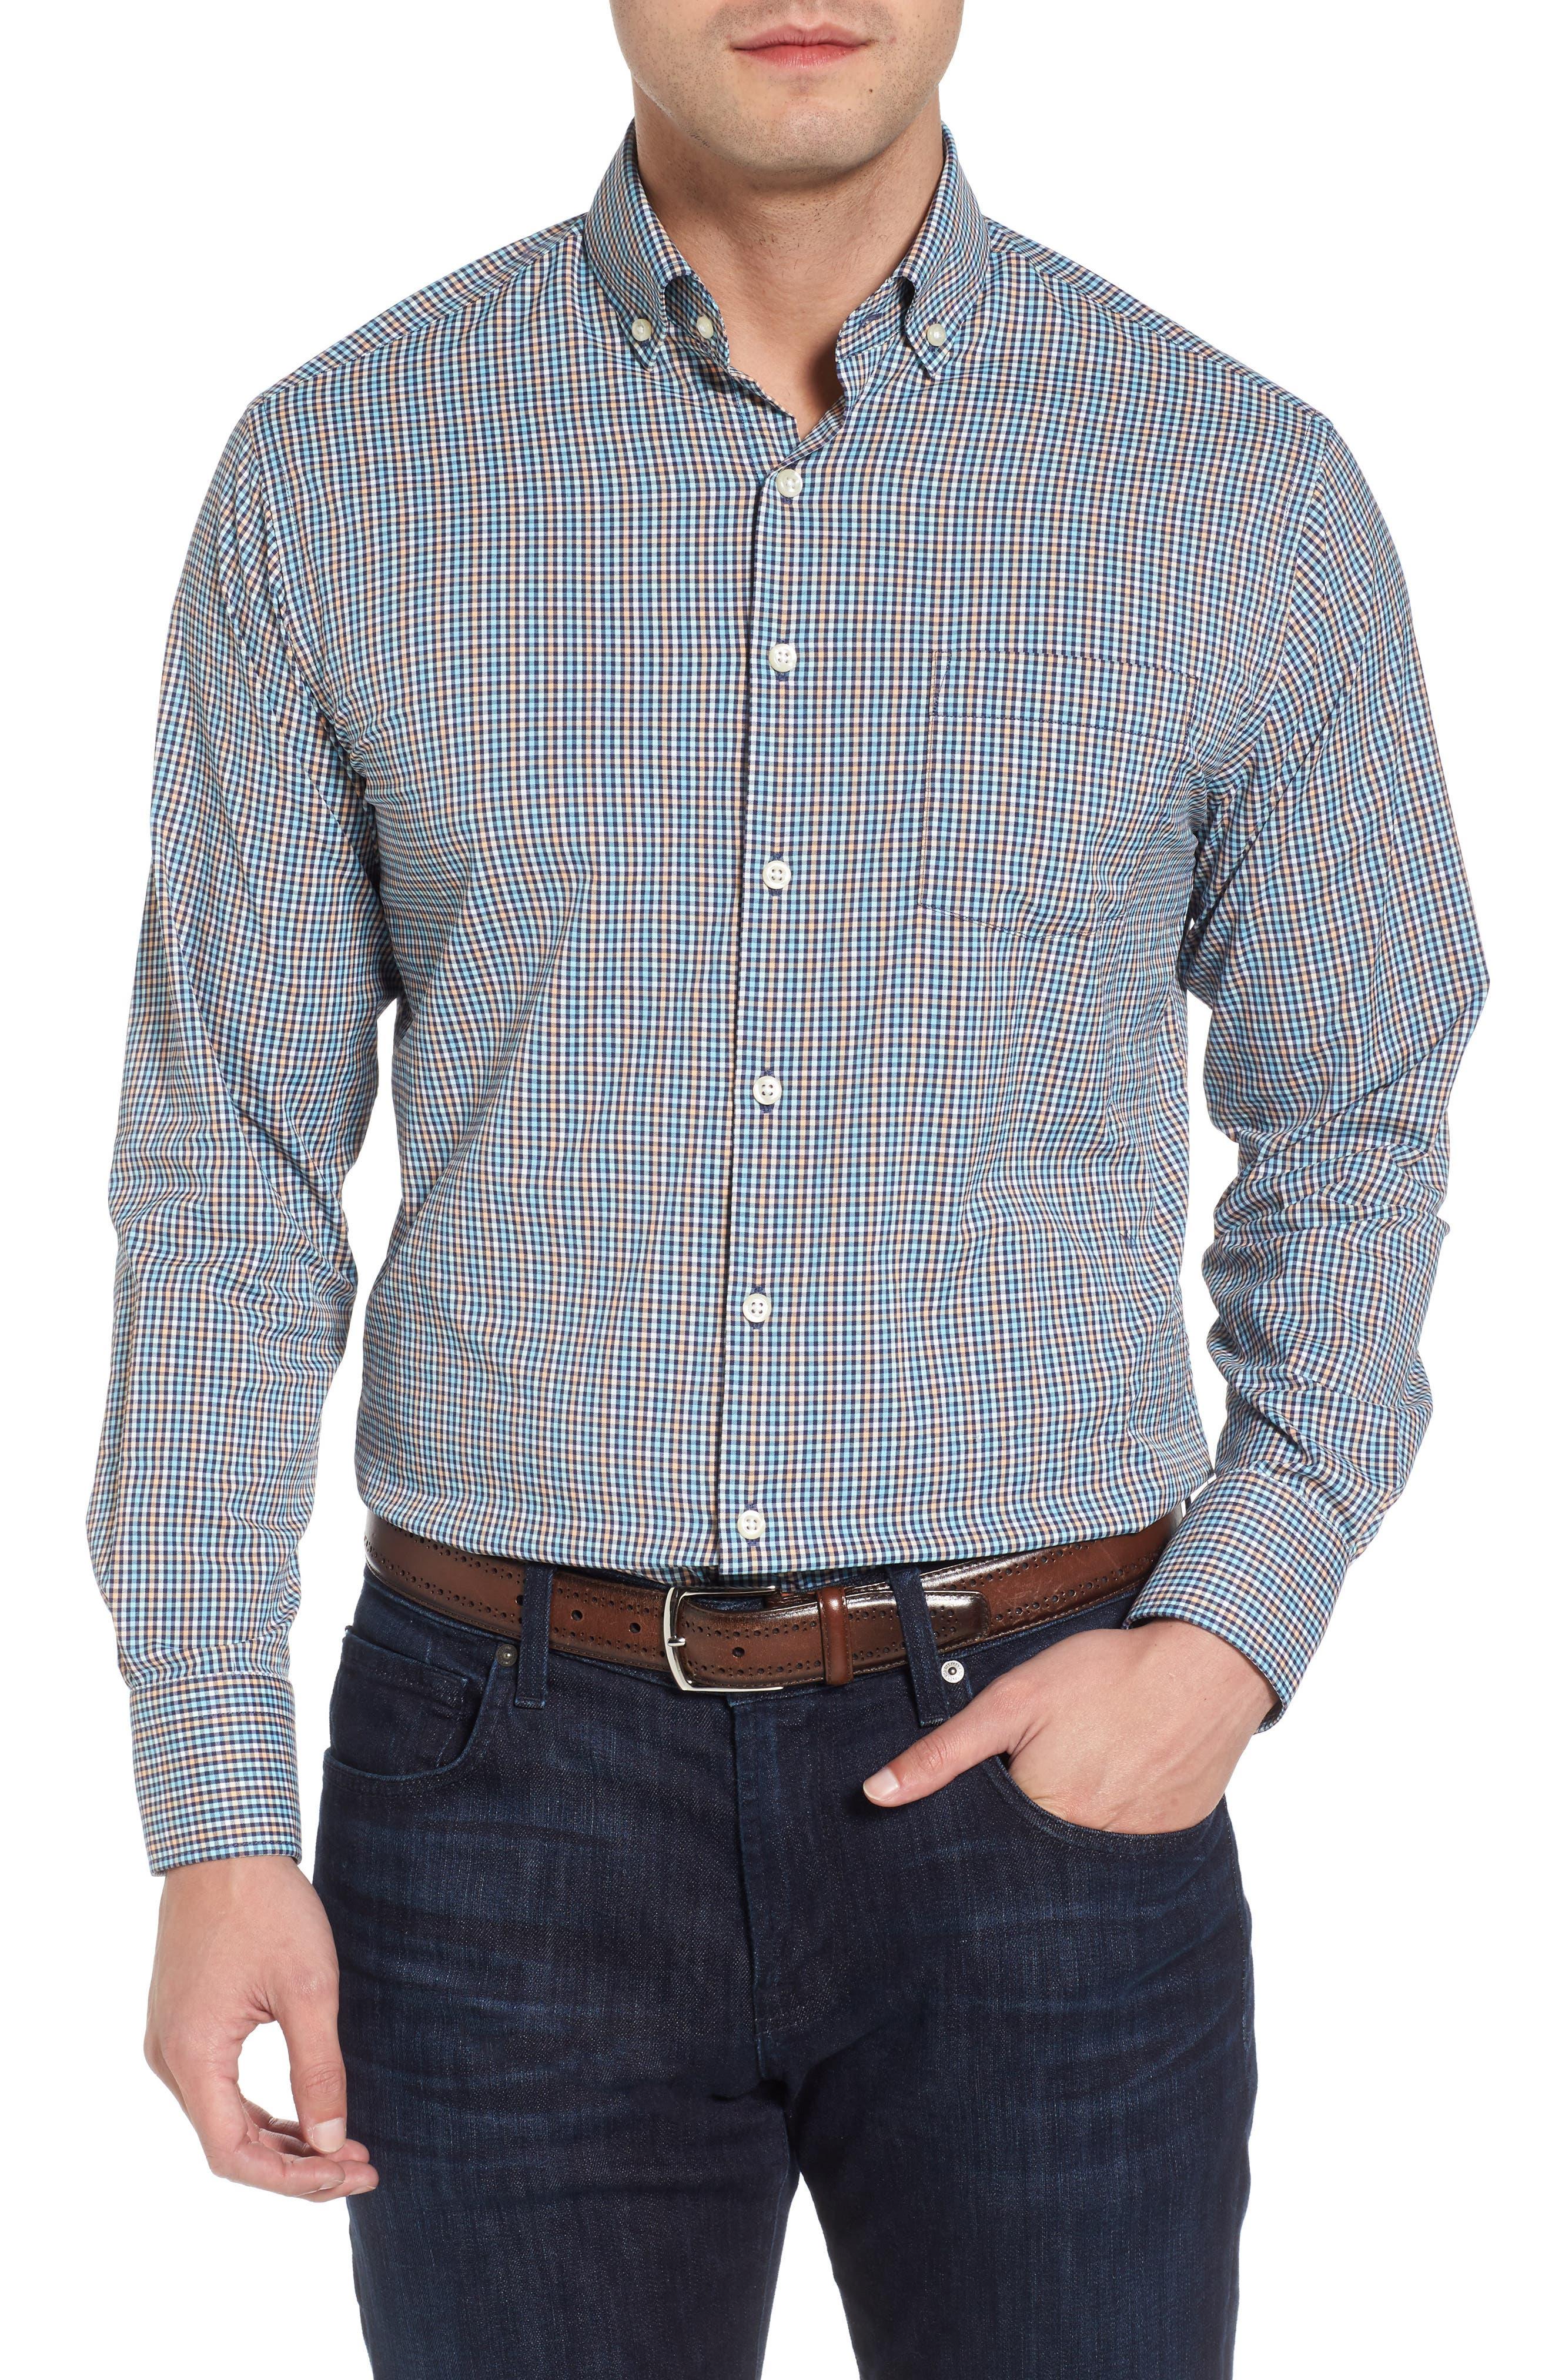 Smedes Regular Fit Check Performance Sport Shirt,                         Main,                         color, Yankee Blue